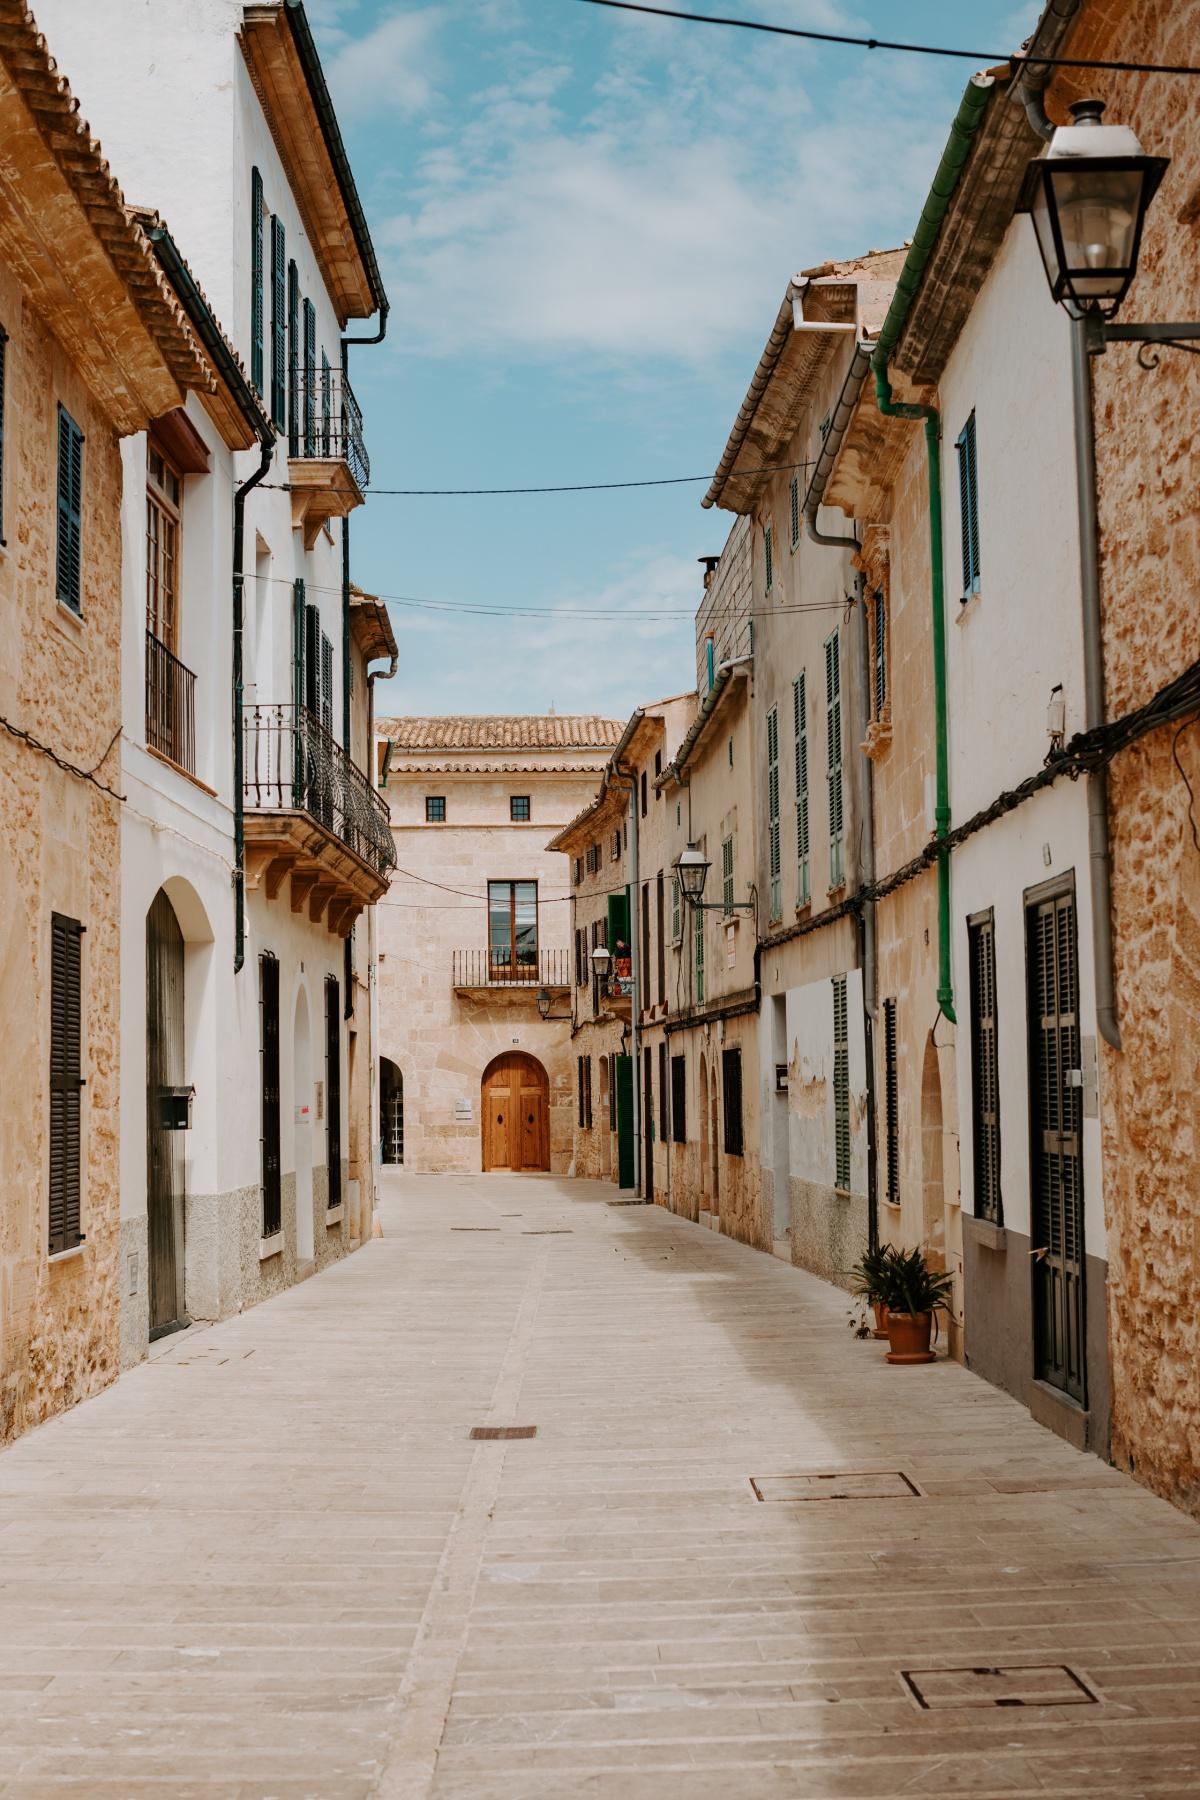 Old spanish architecture in Alcudia Spain